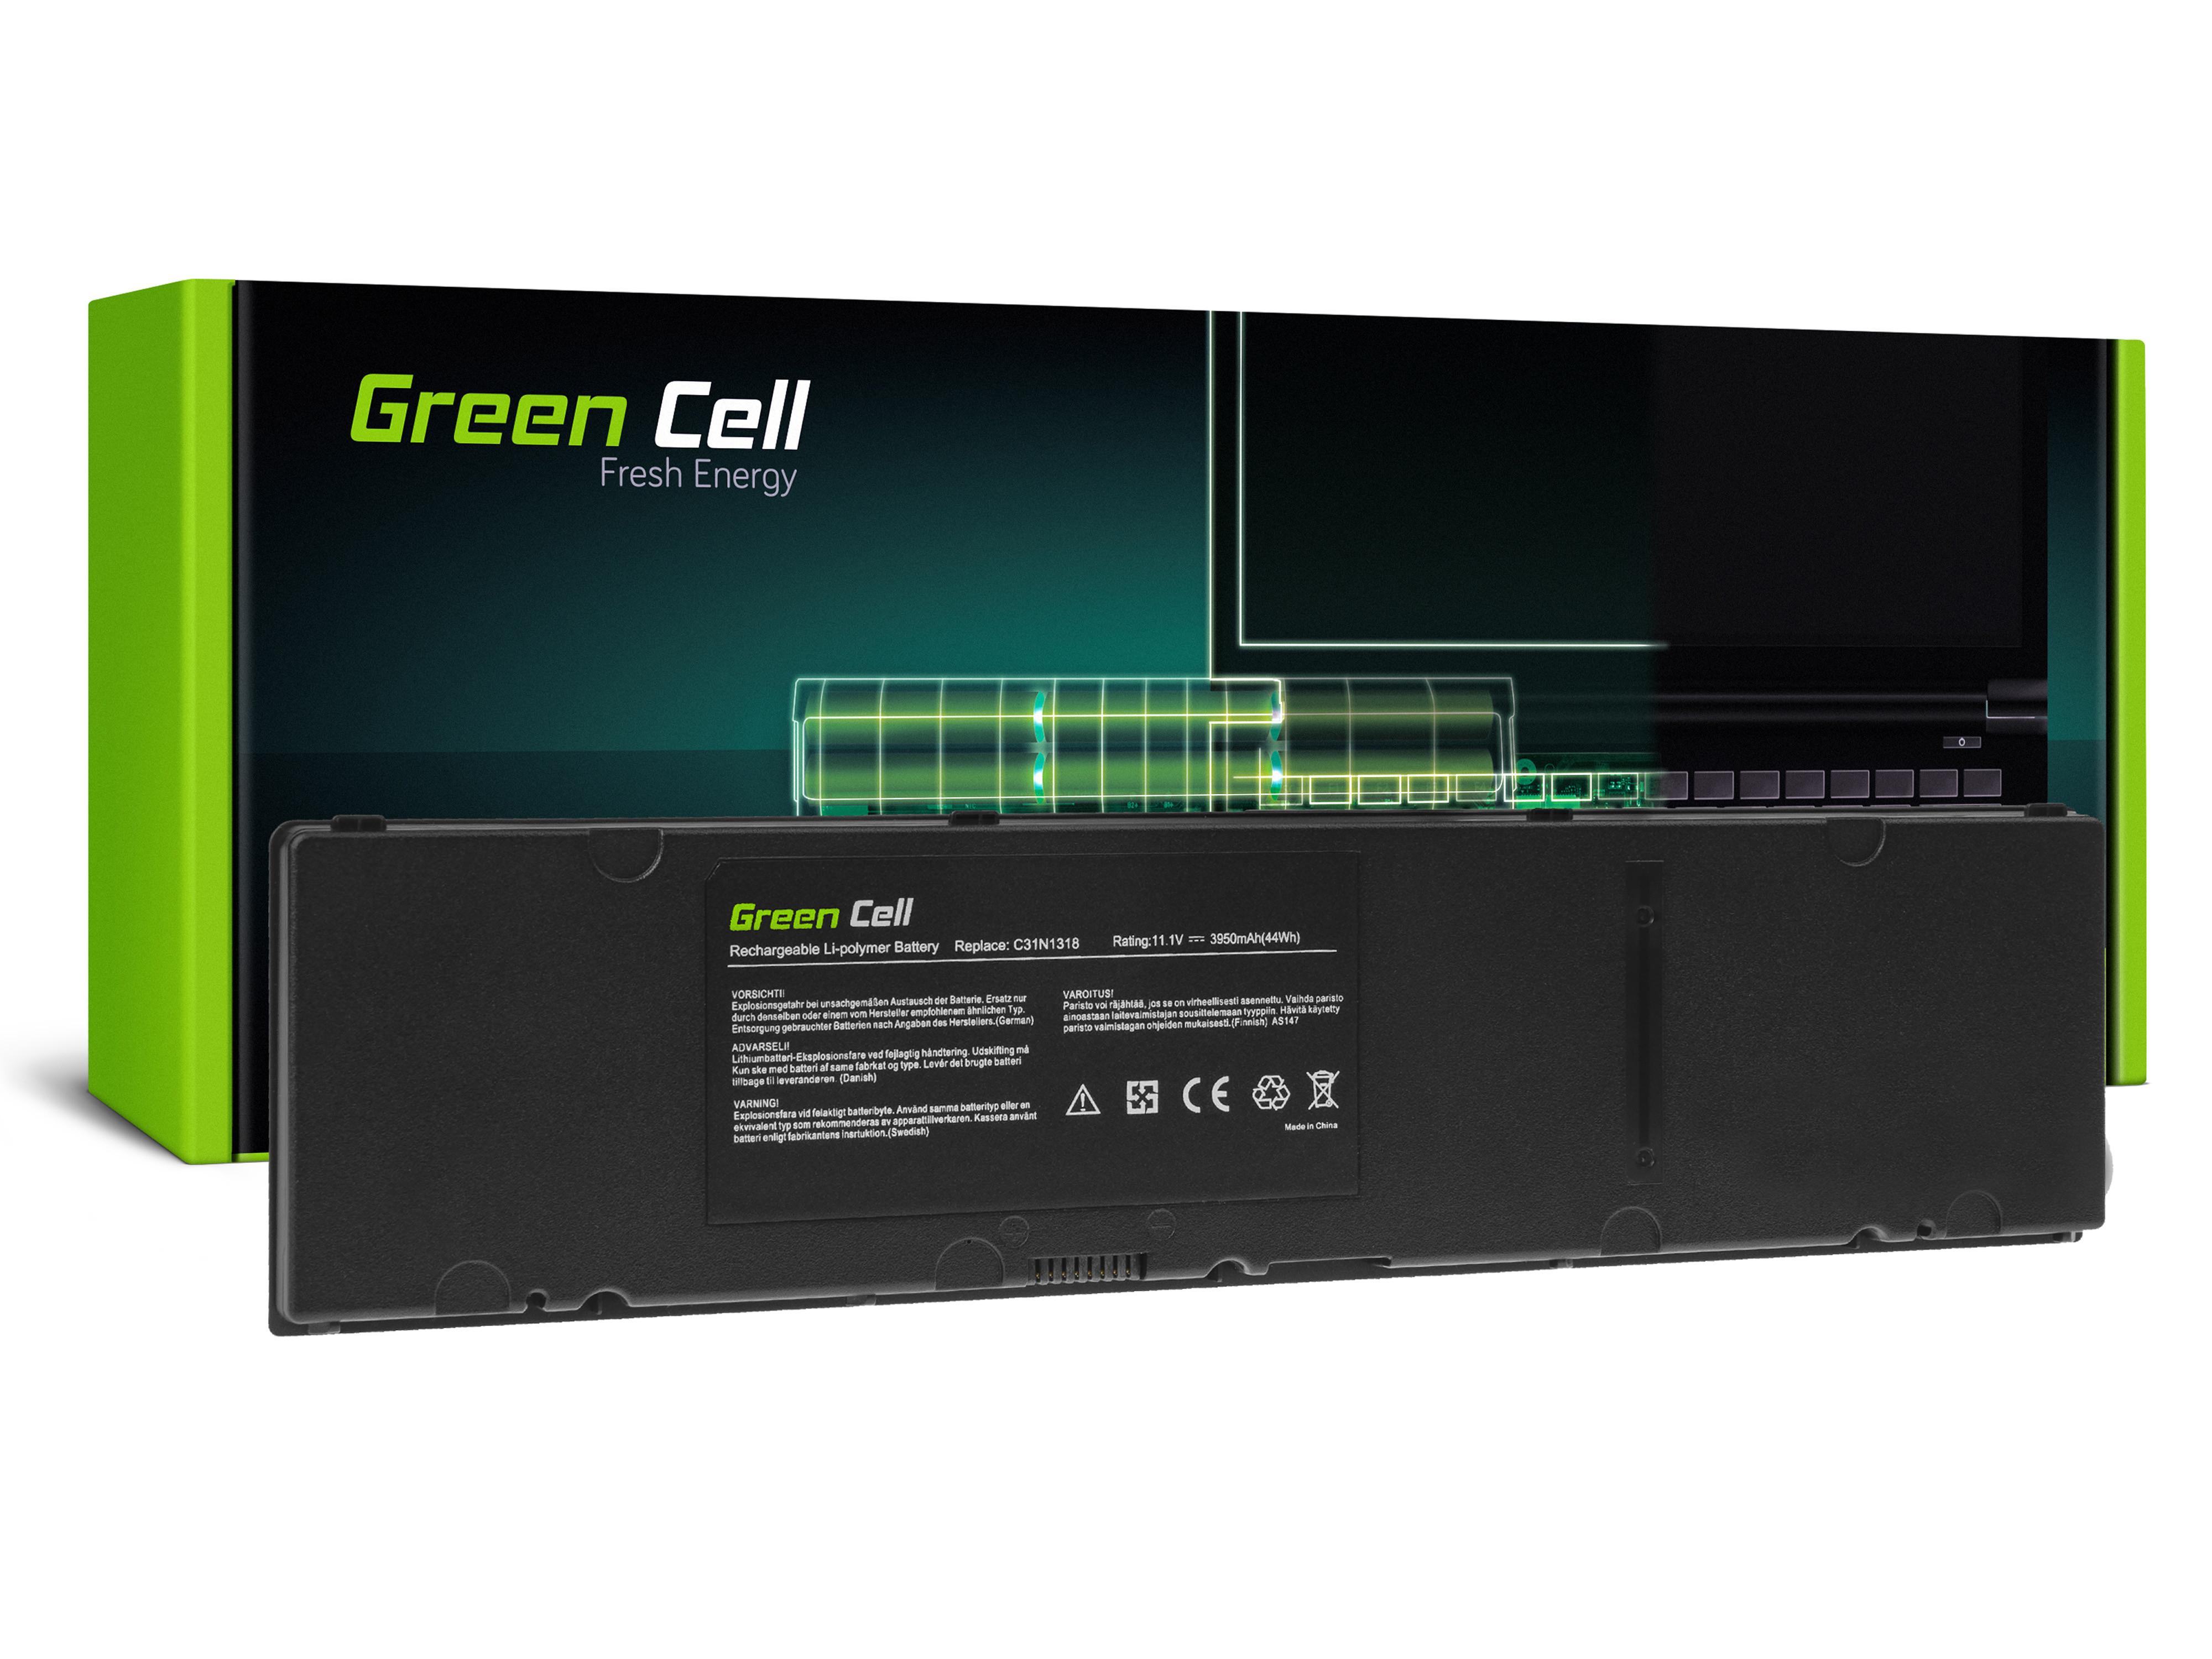 Green Cell Baterie C31N1318 pro AsusPRO PU301 PU301L PU301LA